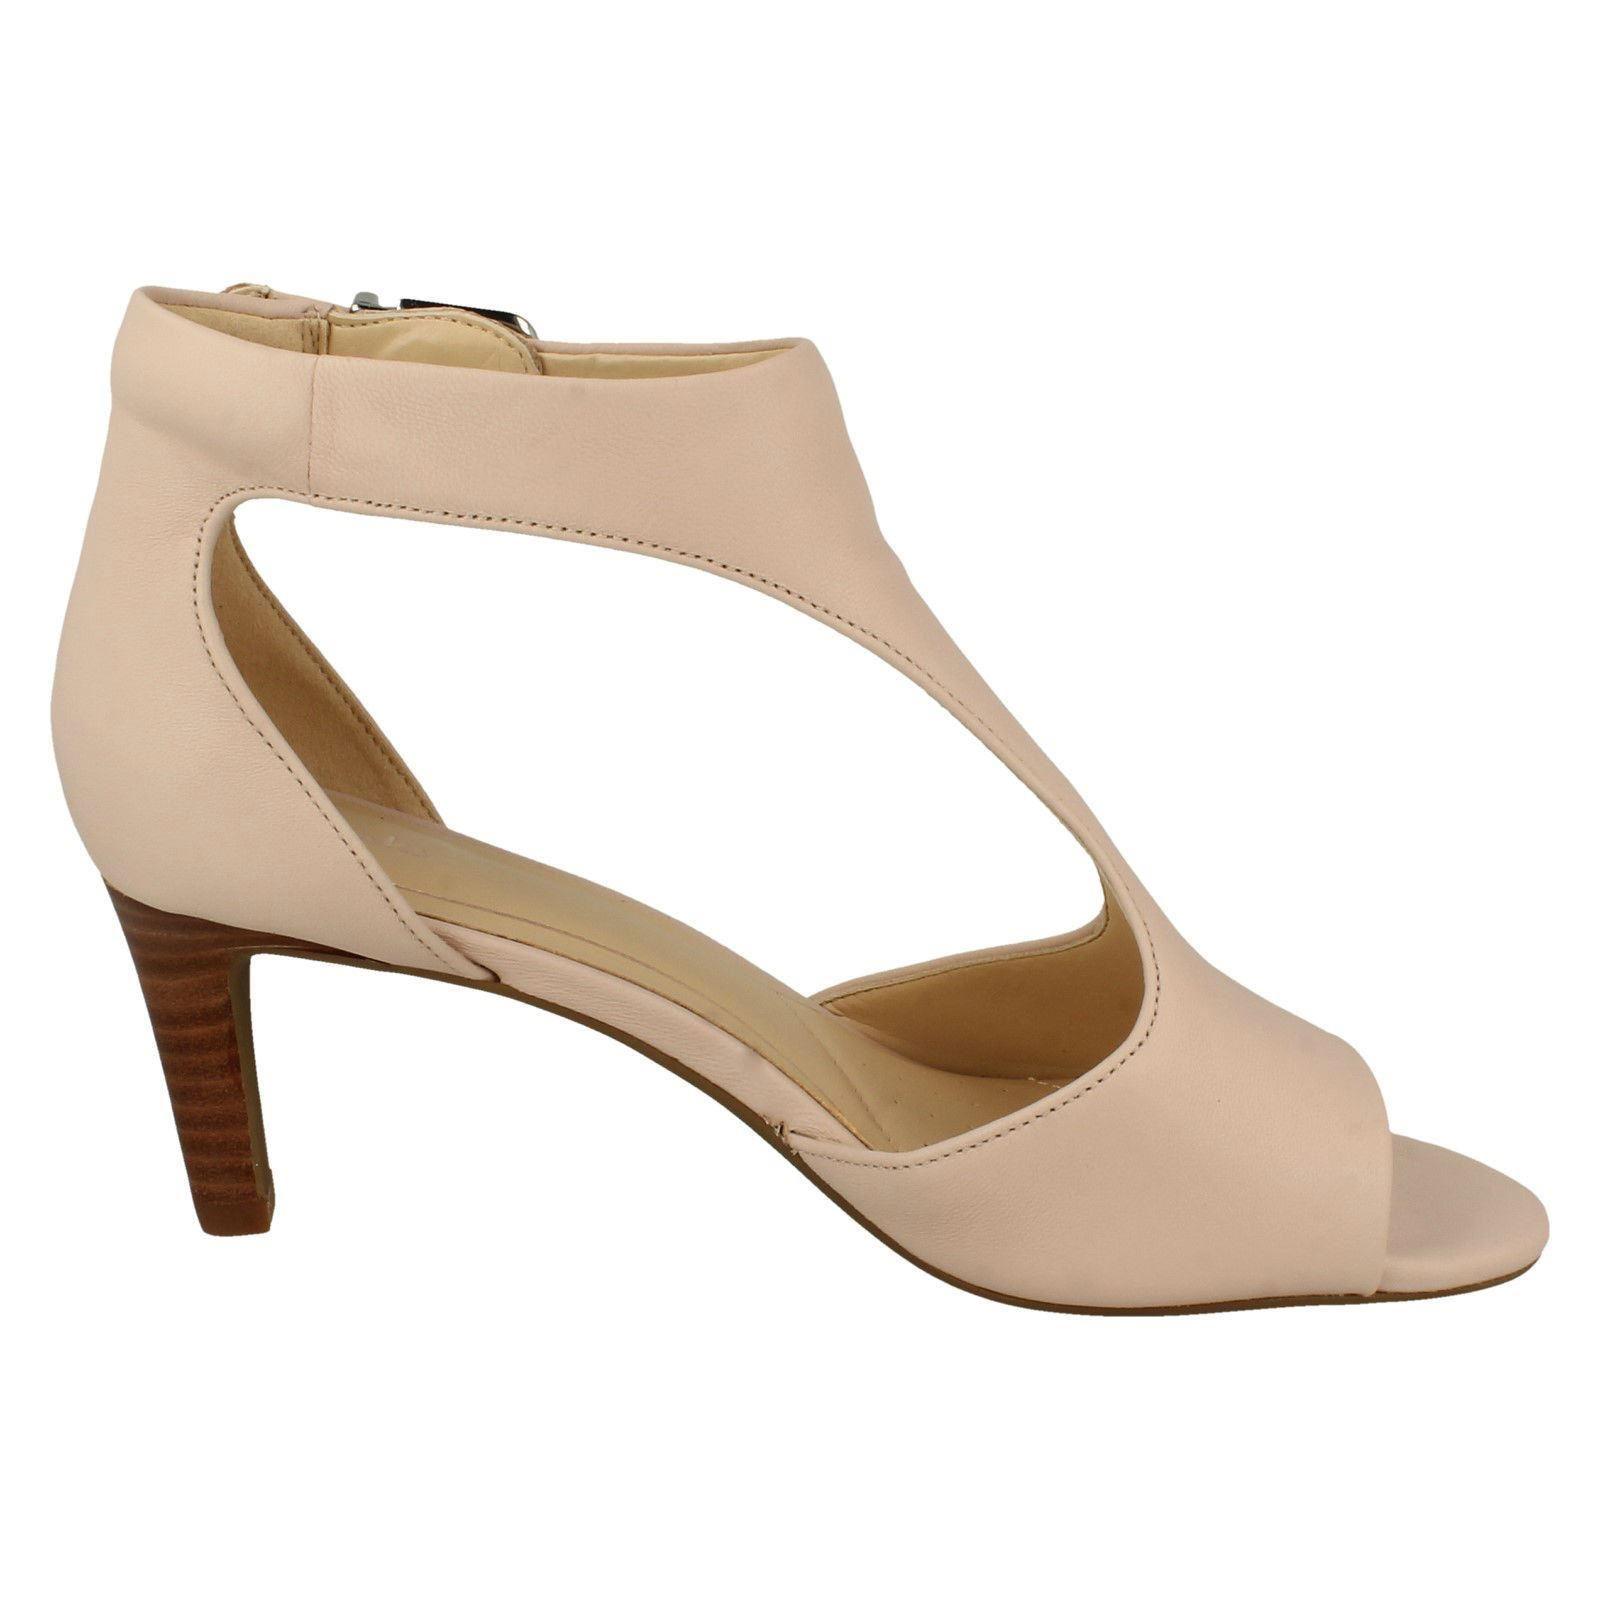 453a71bb0141 Ladies-Clarks-Peep-Toe-Heeled-Sandals-Laureti-Star thumbnail